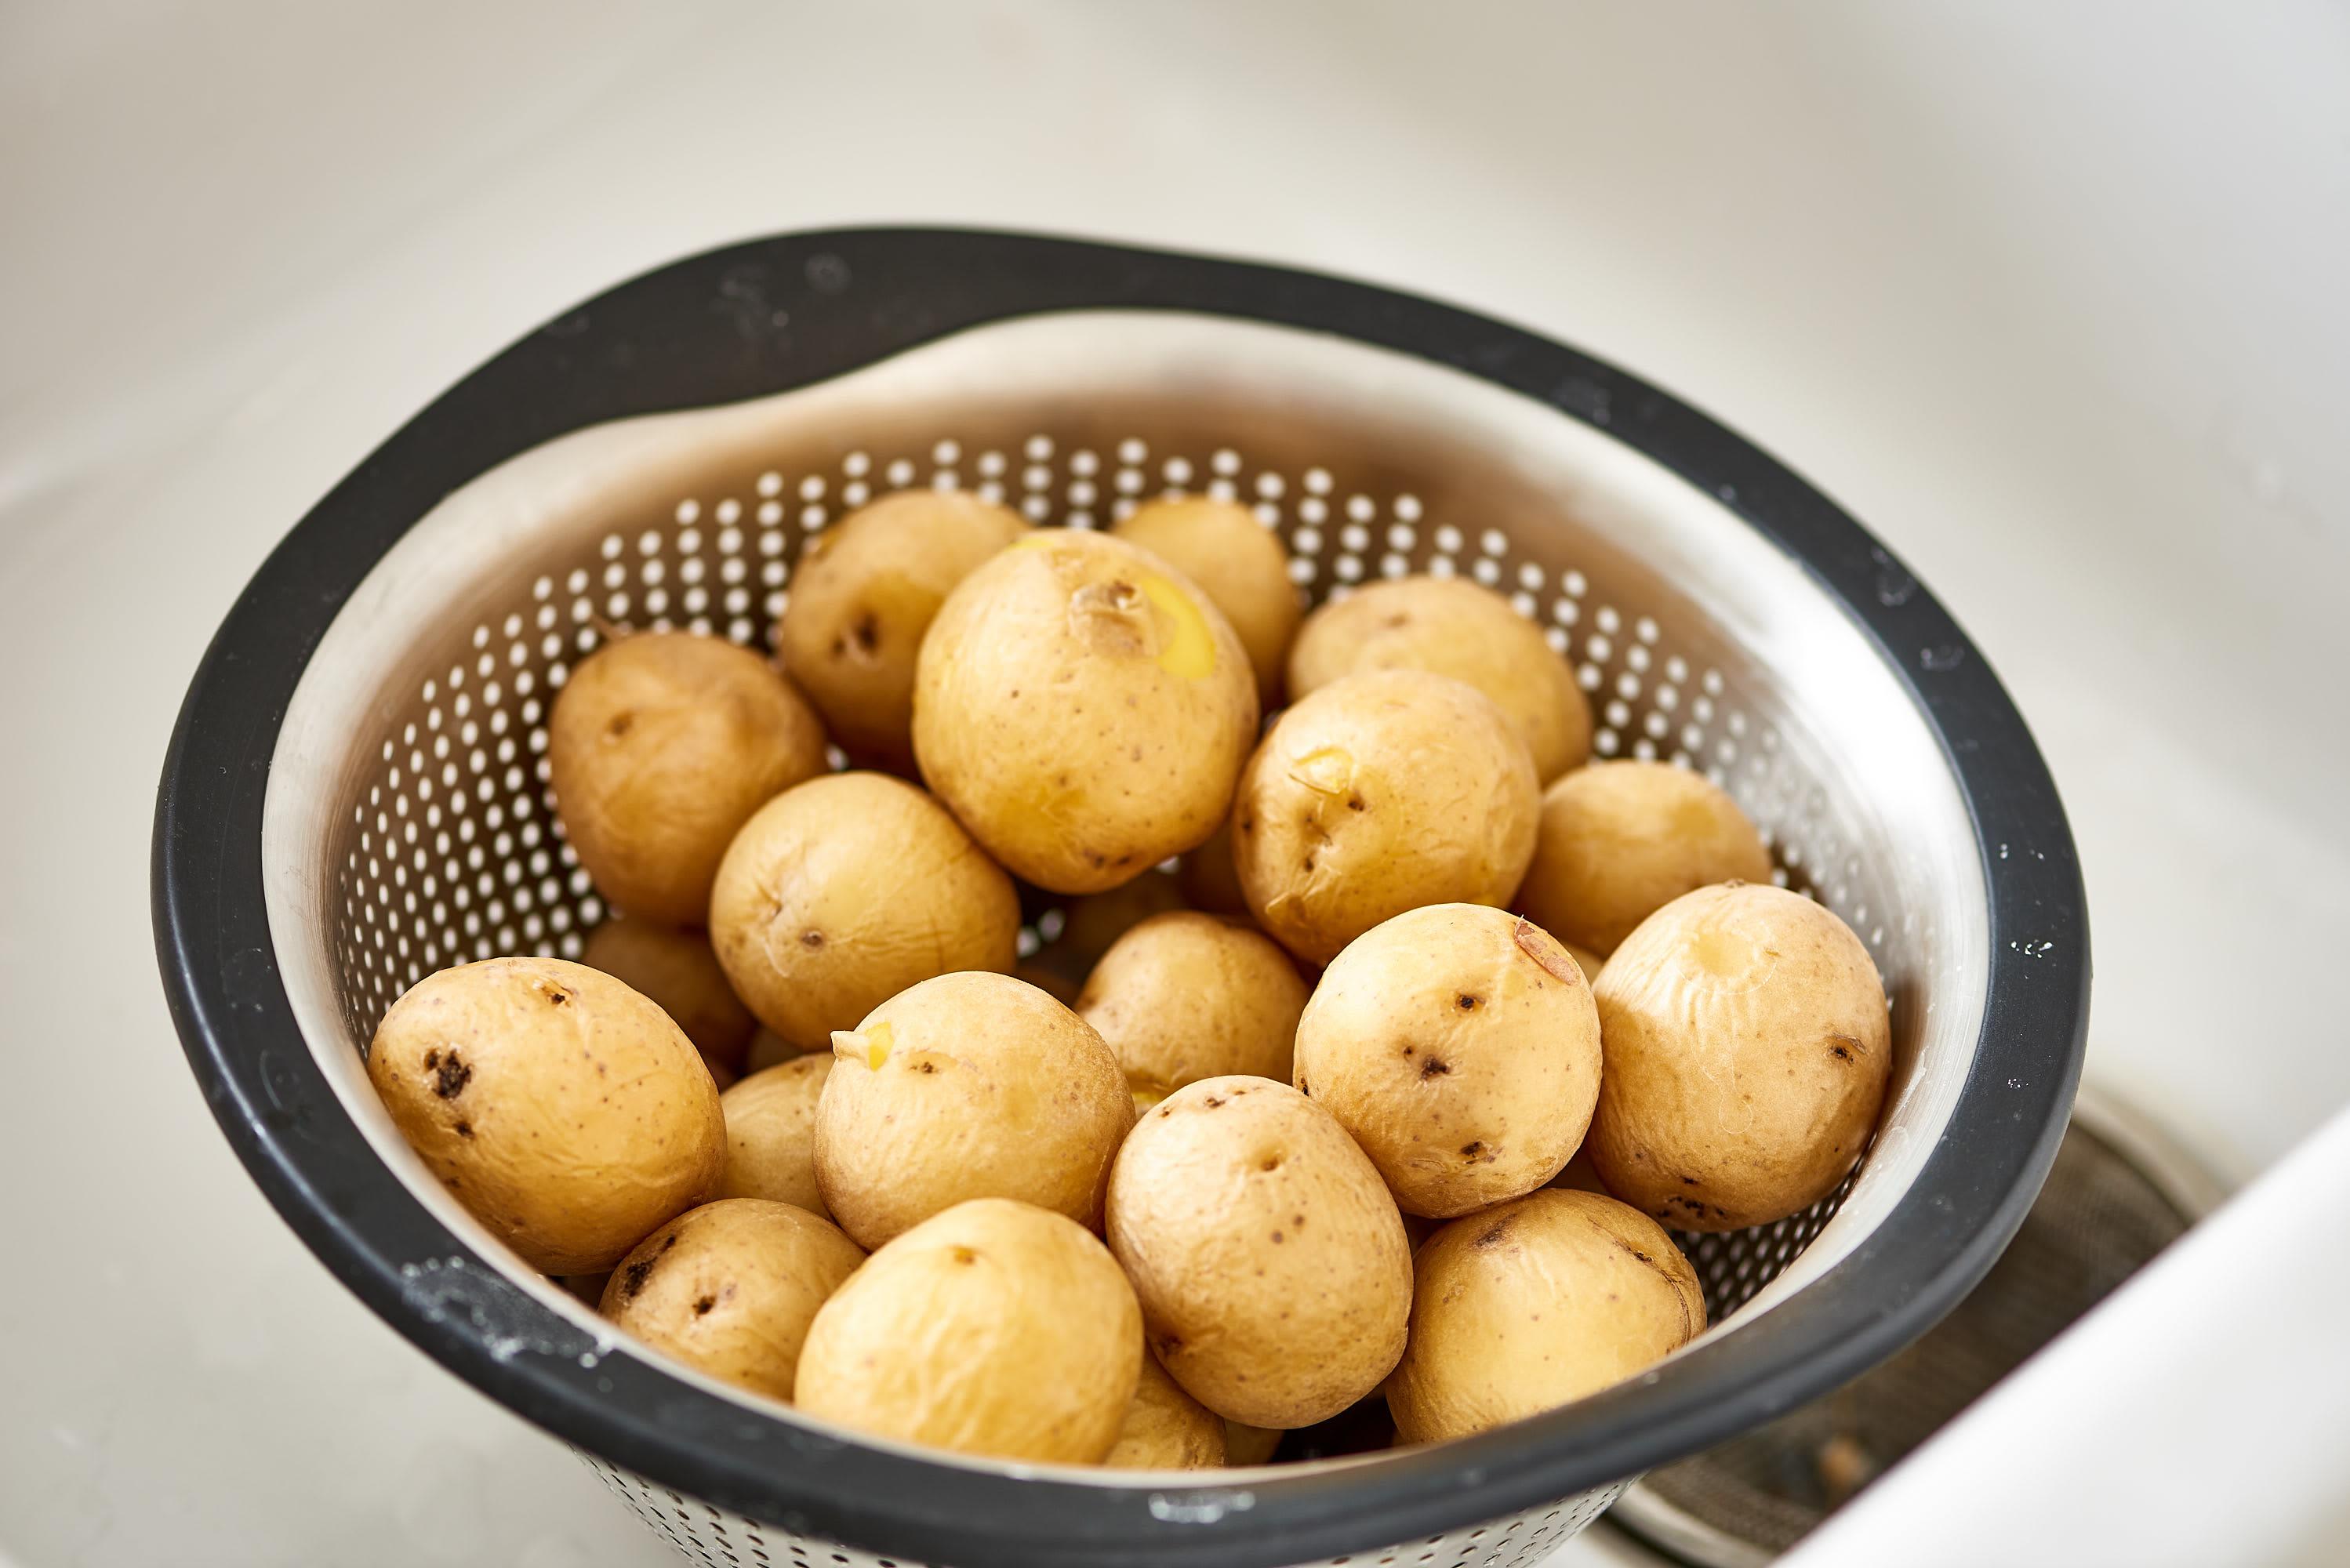 Crash Hot Potatoes Crispy Smashed Potatoes Recipe Kitchn